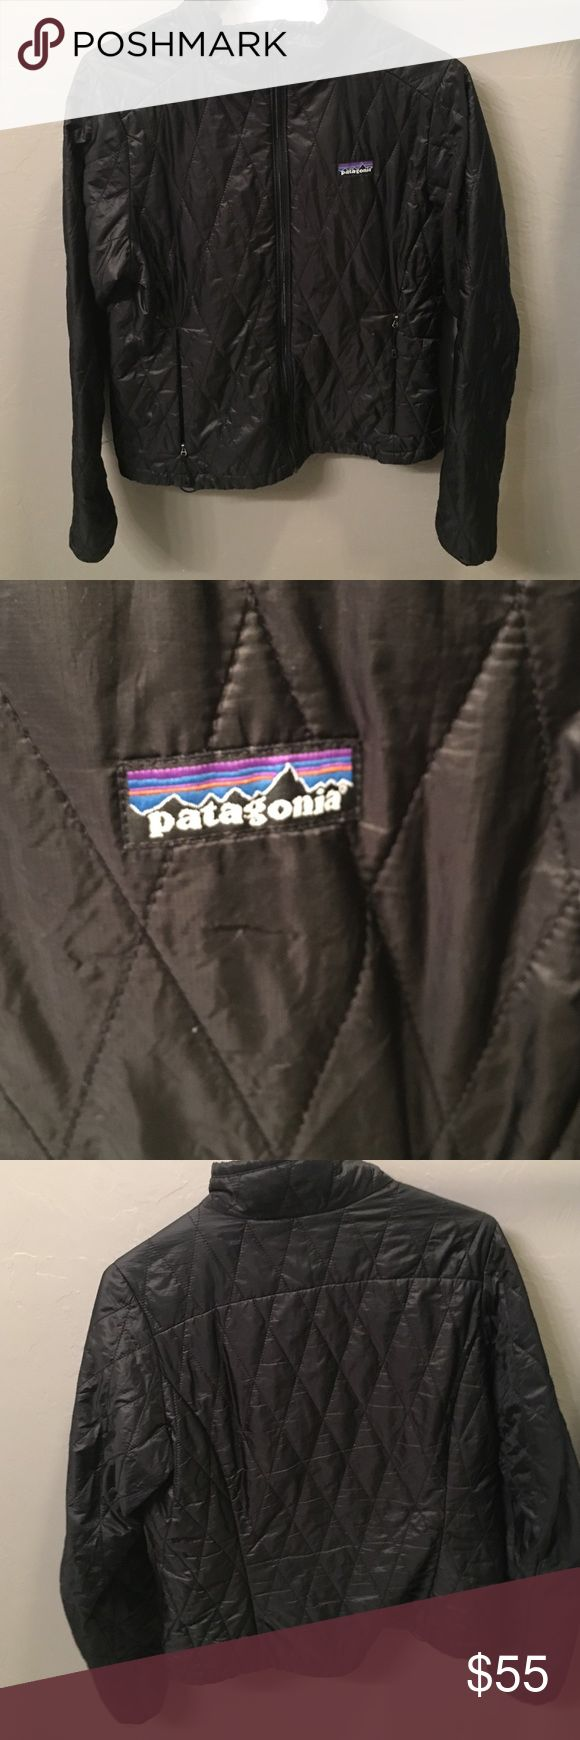 Veterans Day Sale🇺🇸Patagonia Jacket Black Patagonia light puff jacket! Patagonia Jackets & Coats